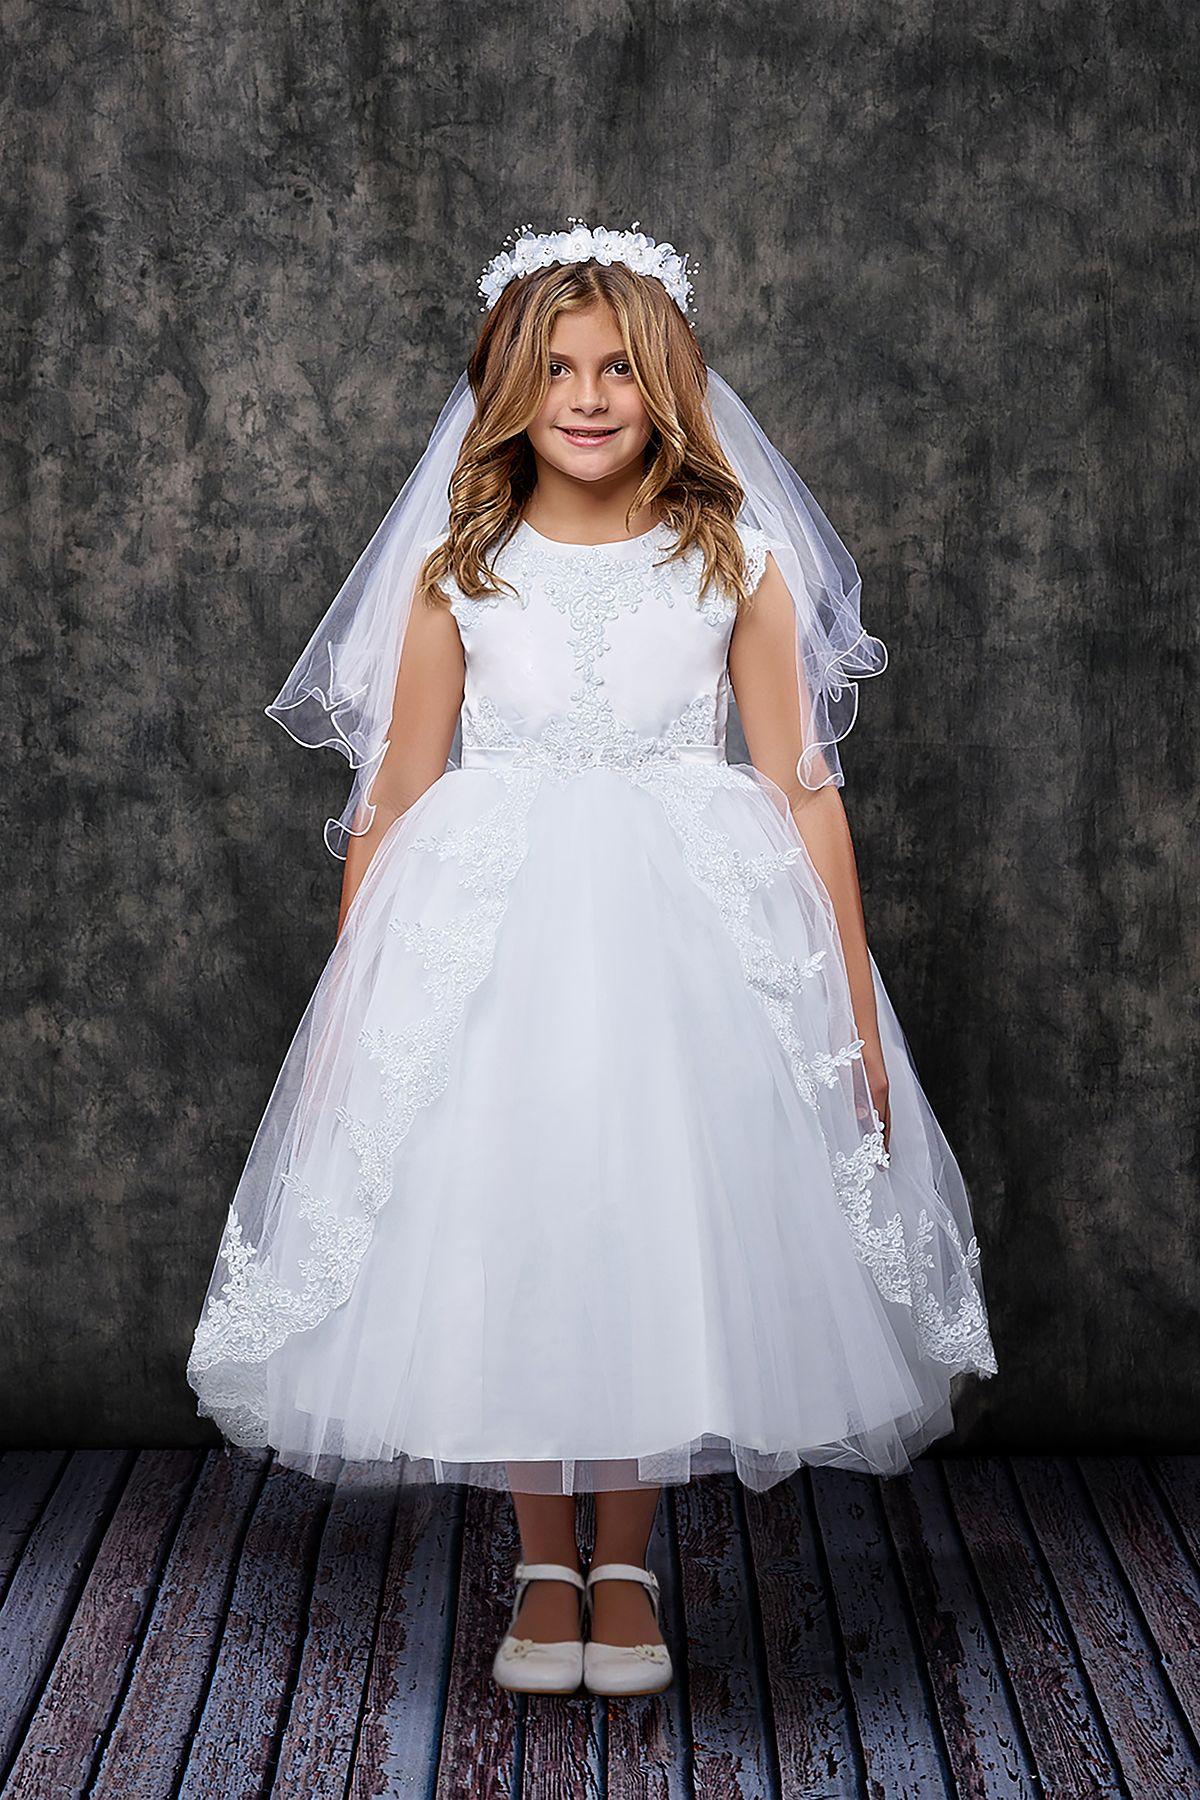 782b19e2caa Lace Applique Swoop Train Communion Dress